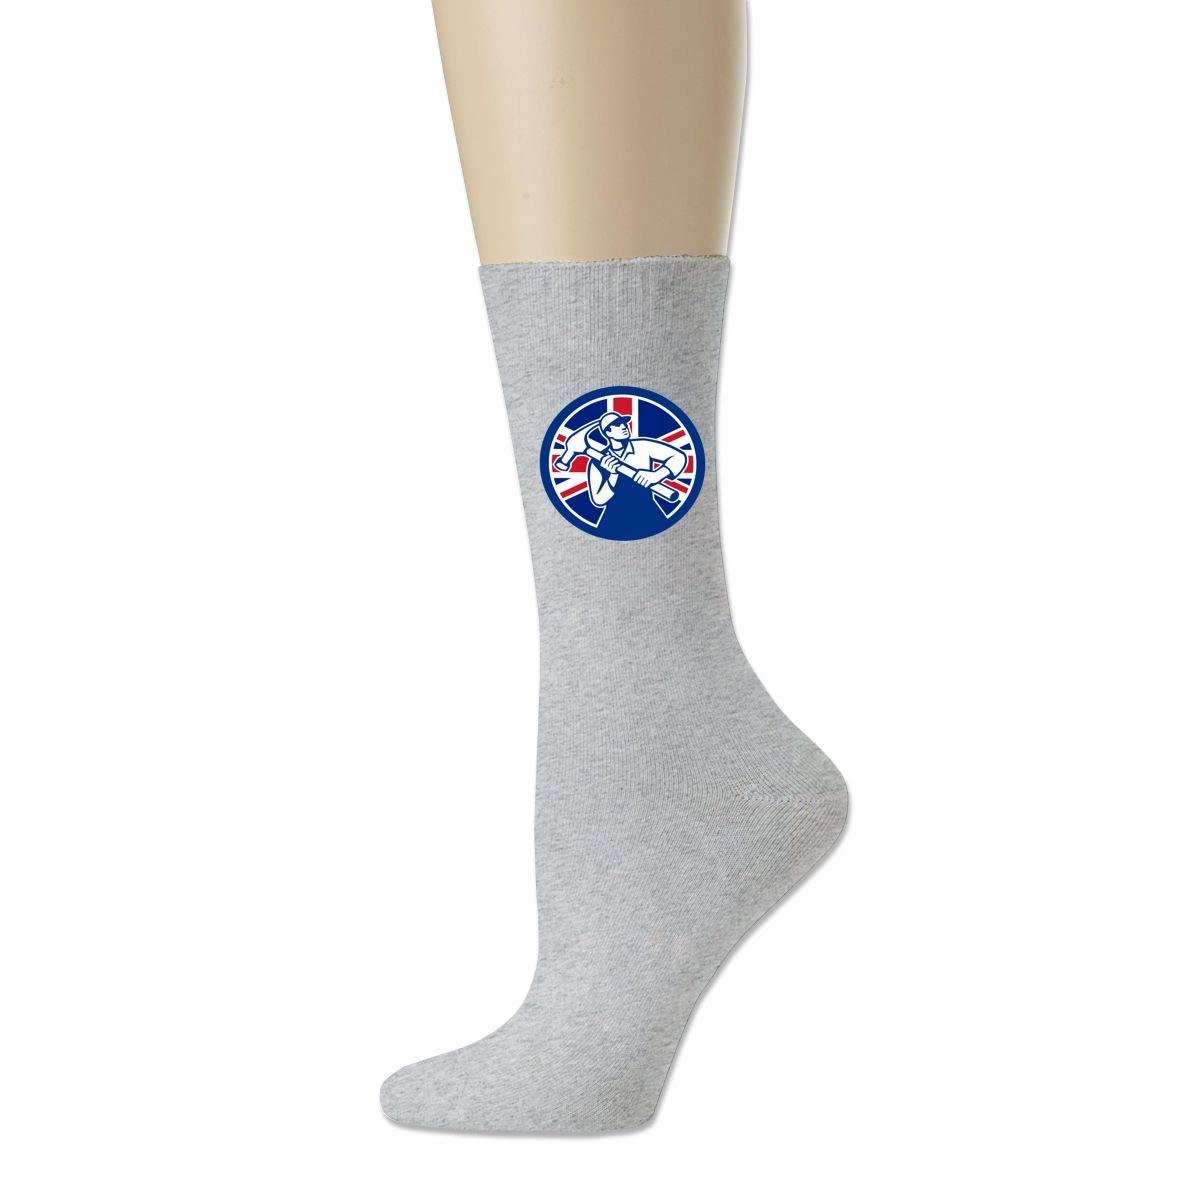 Rigg-socks British Joiner Union Jack Flag Icon Mens Comfortable Sport Socks Black